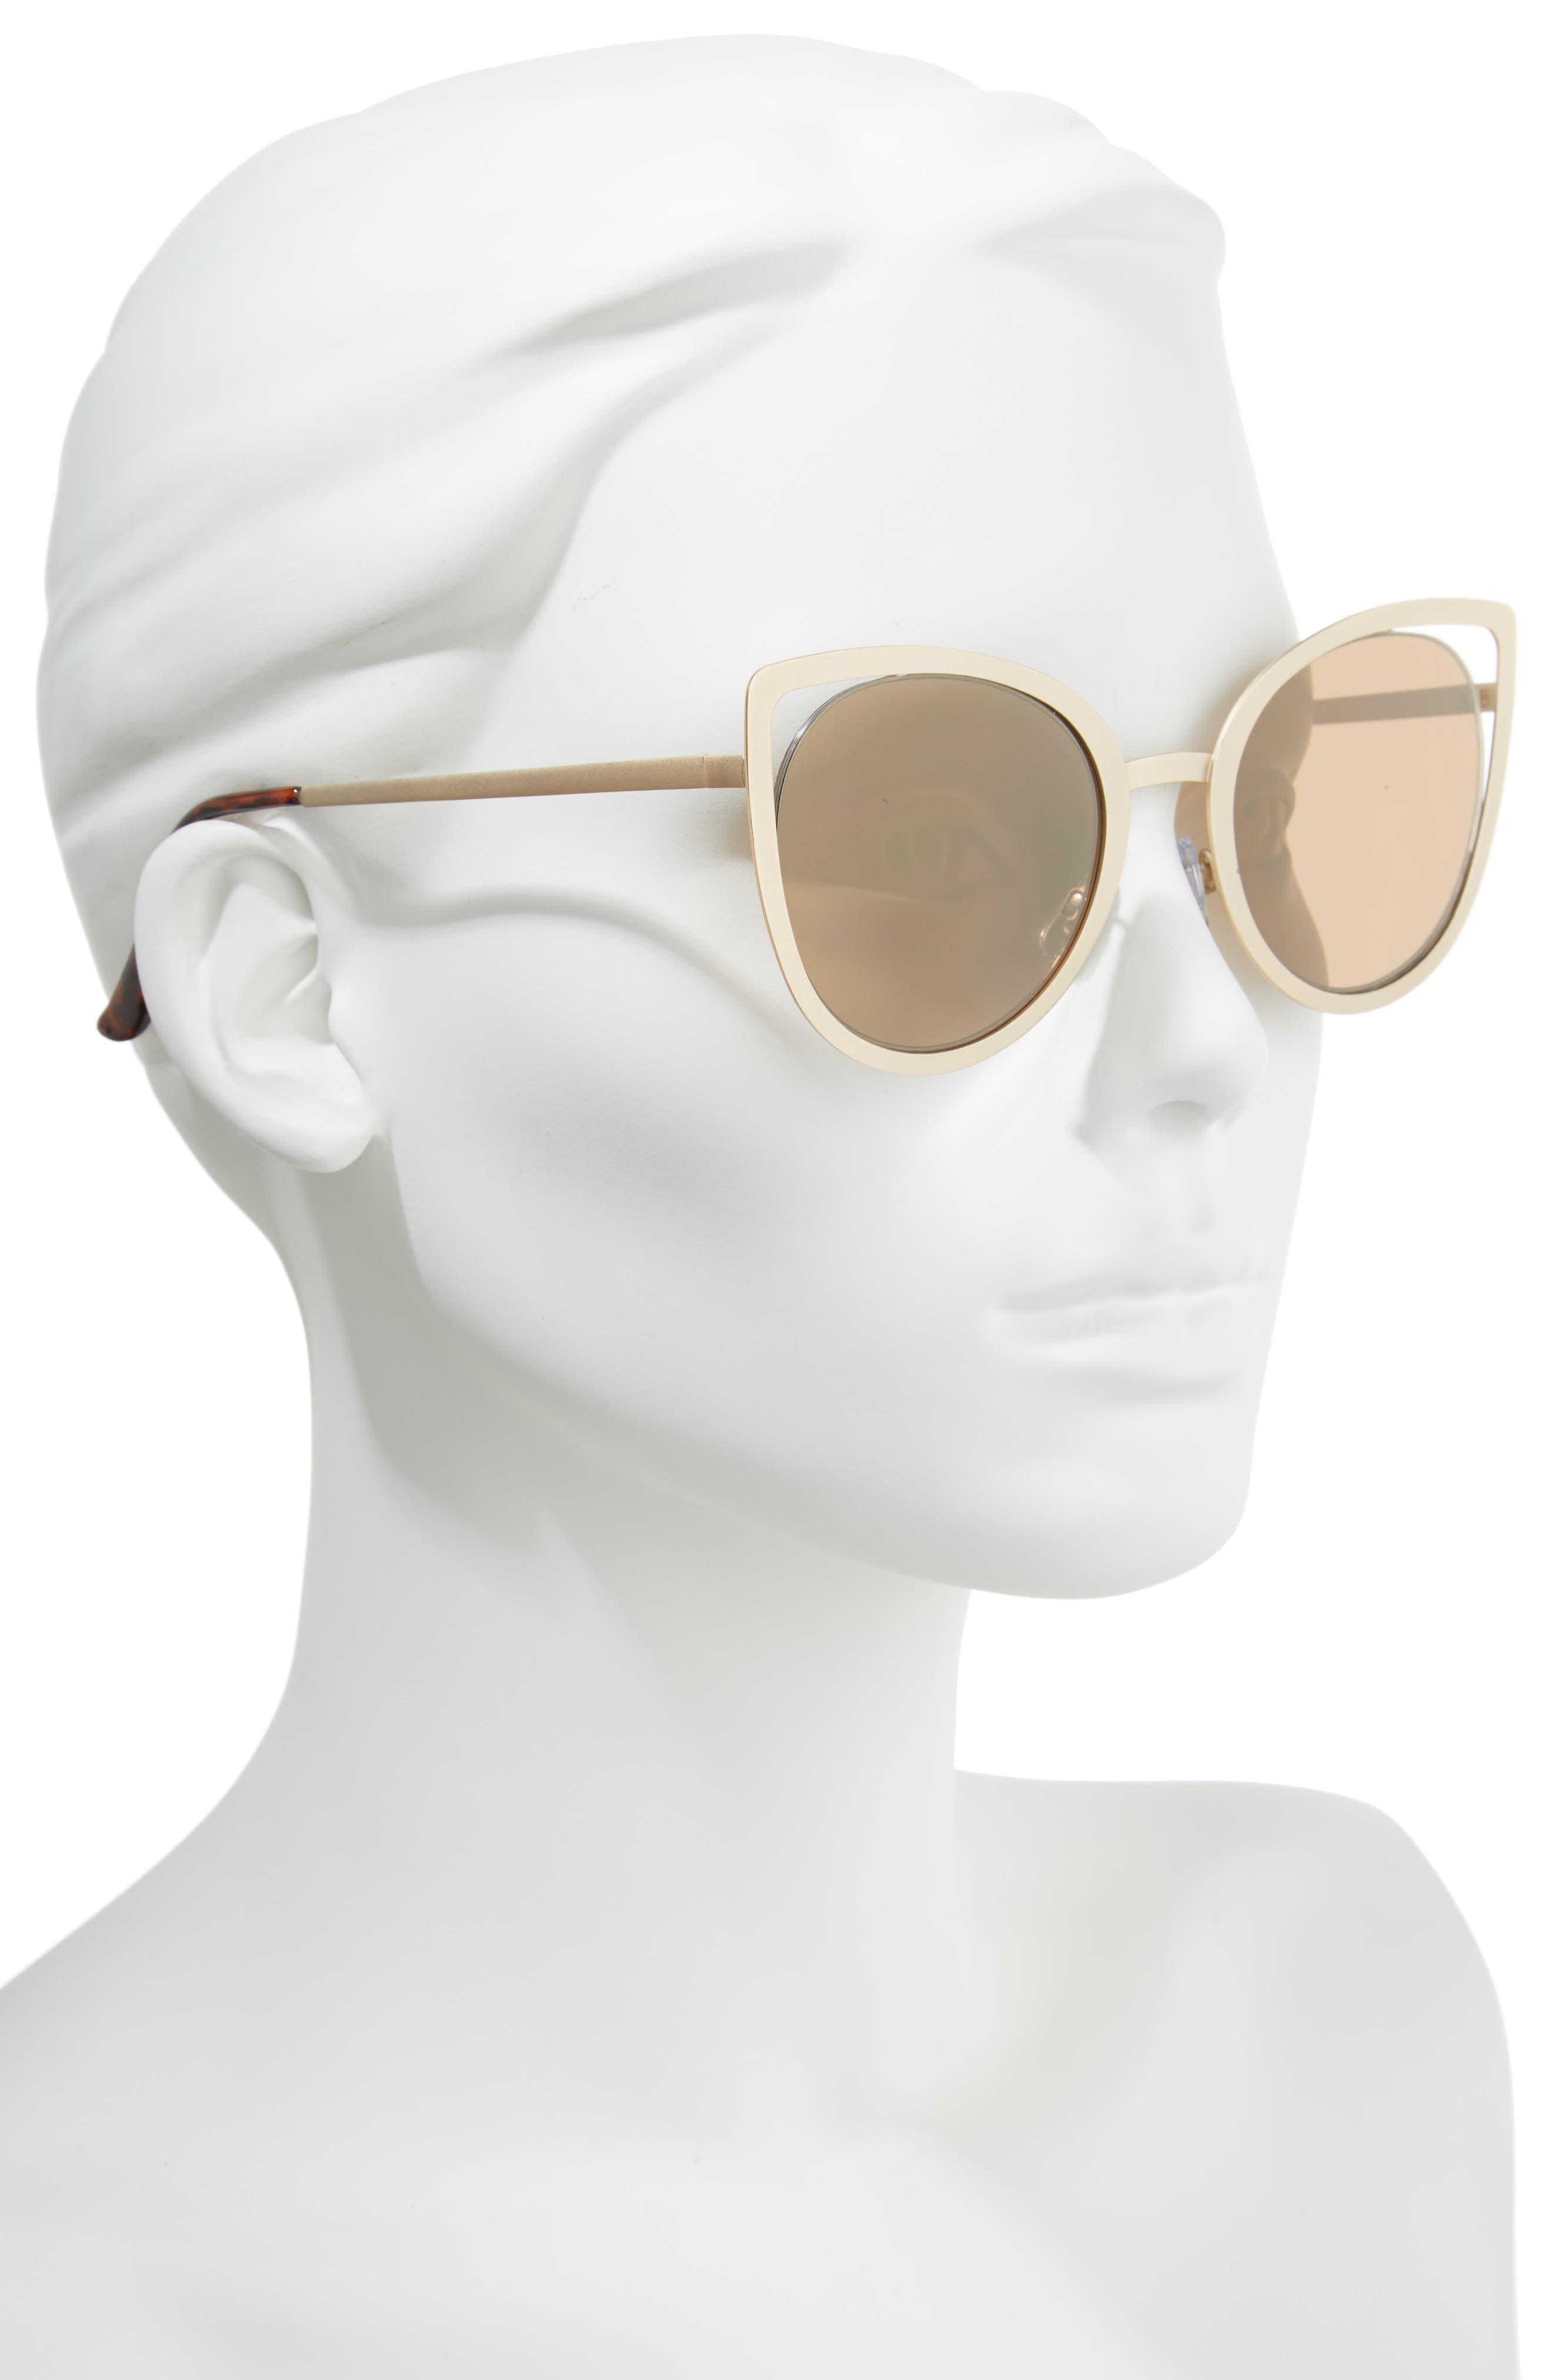 53mm Cutout Cat Eye Sunglasses,                             Alternate thumbnail 2, color,                             Gold